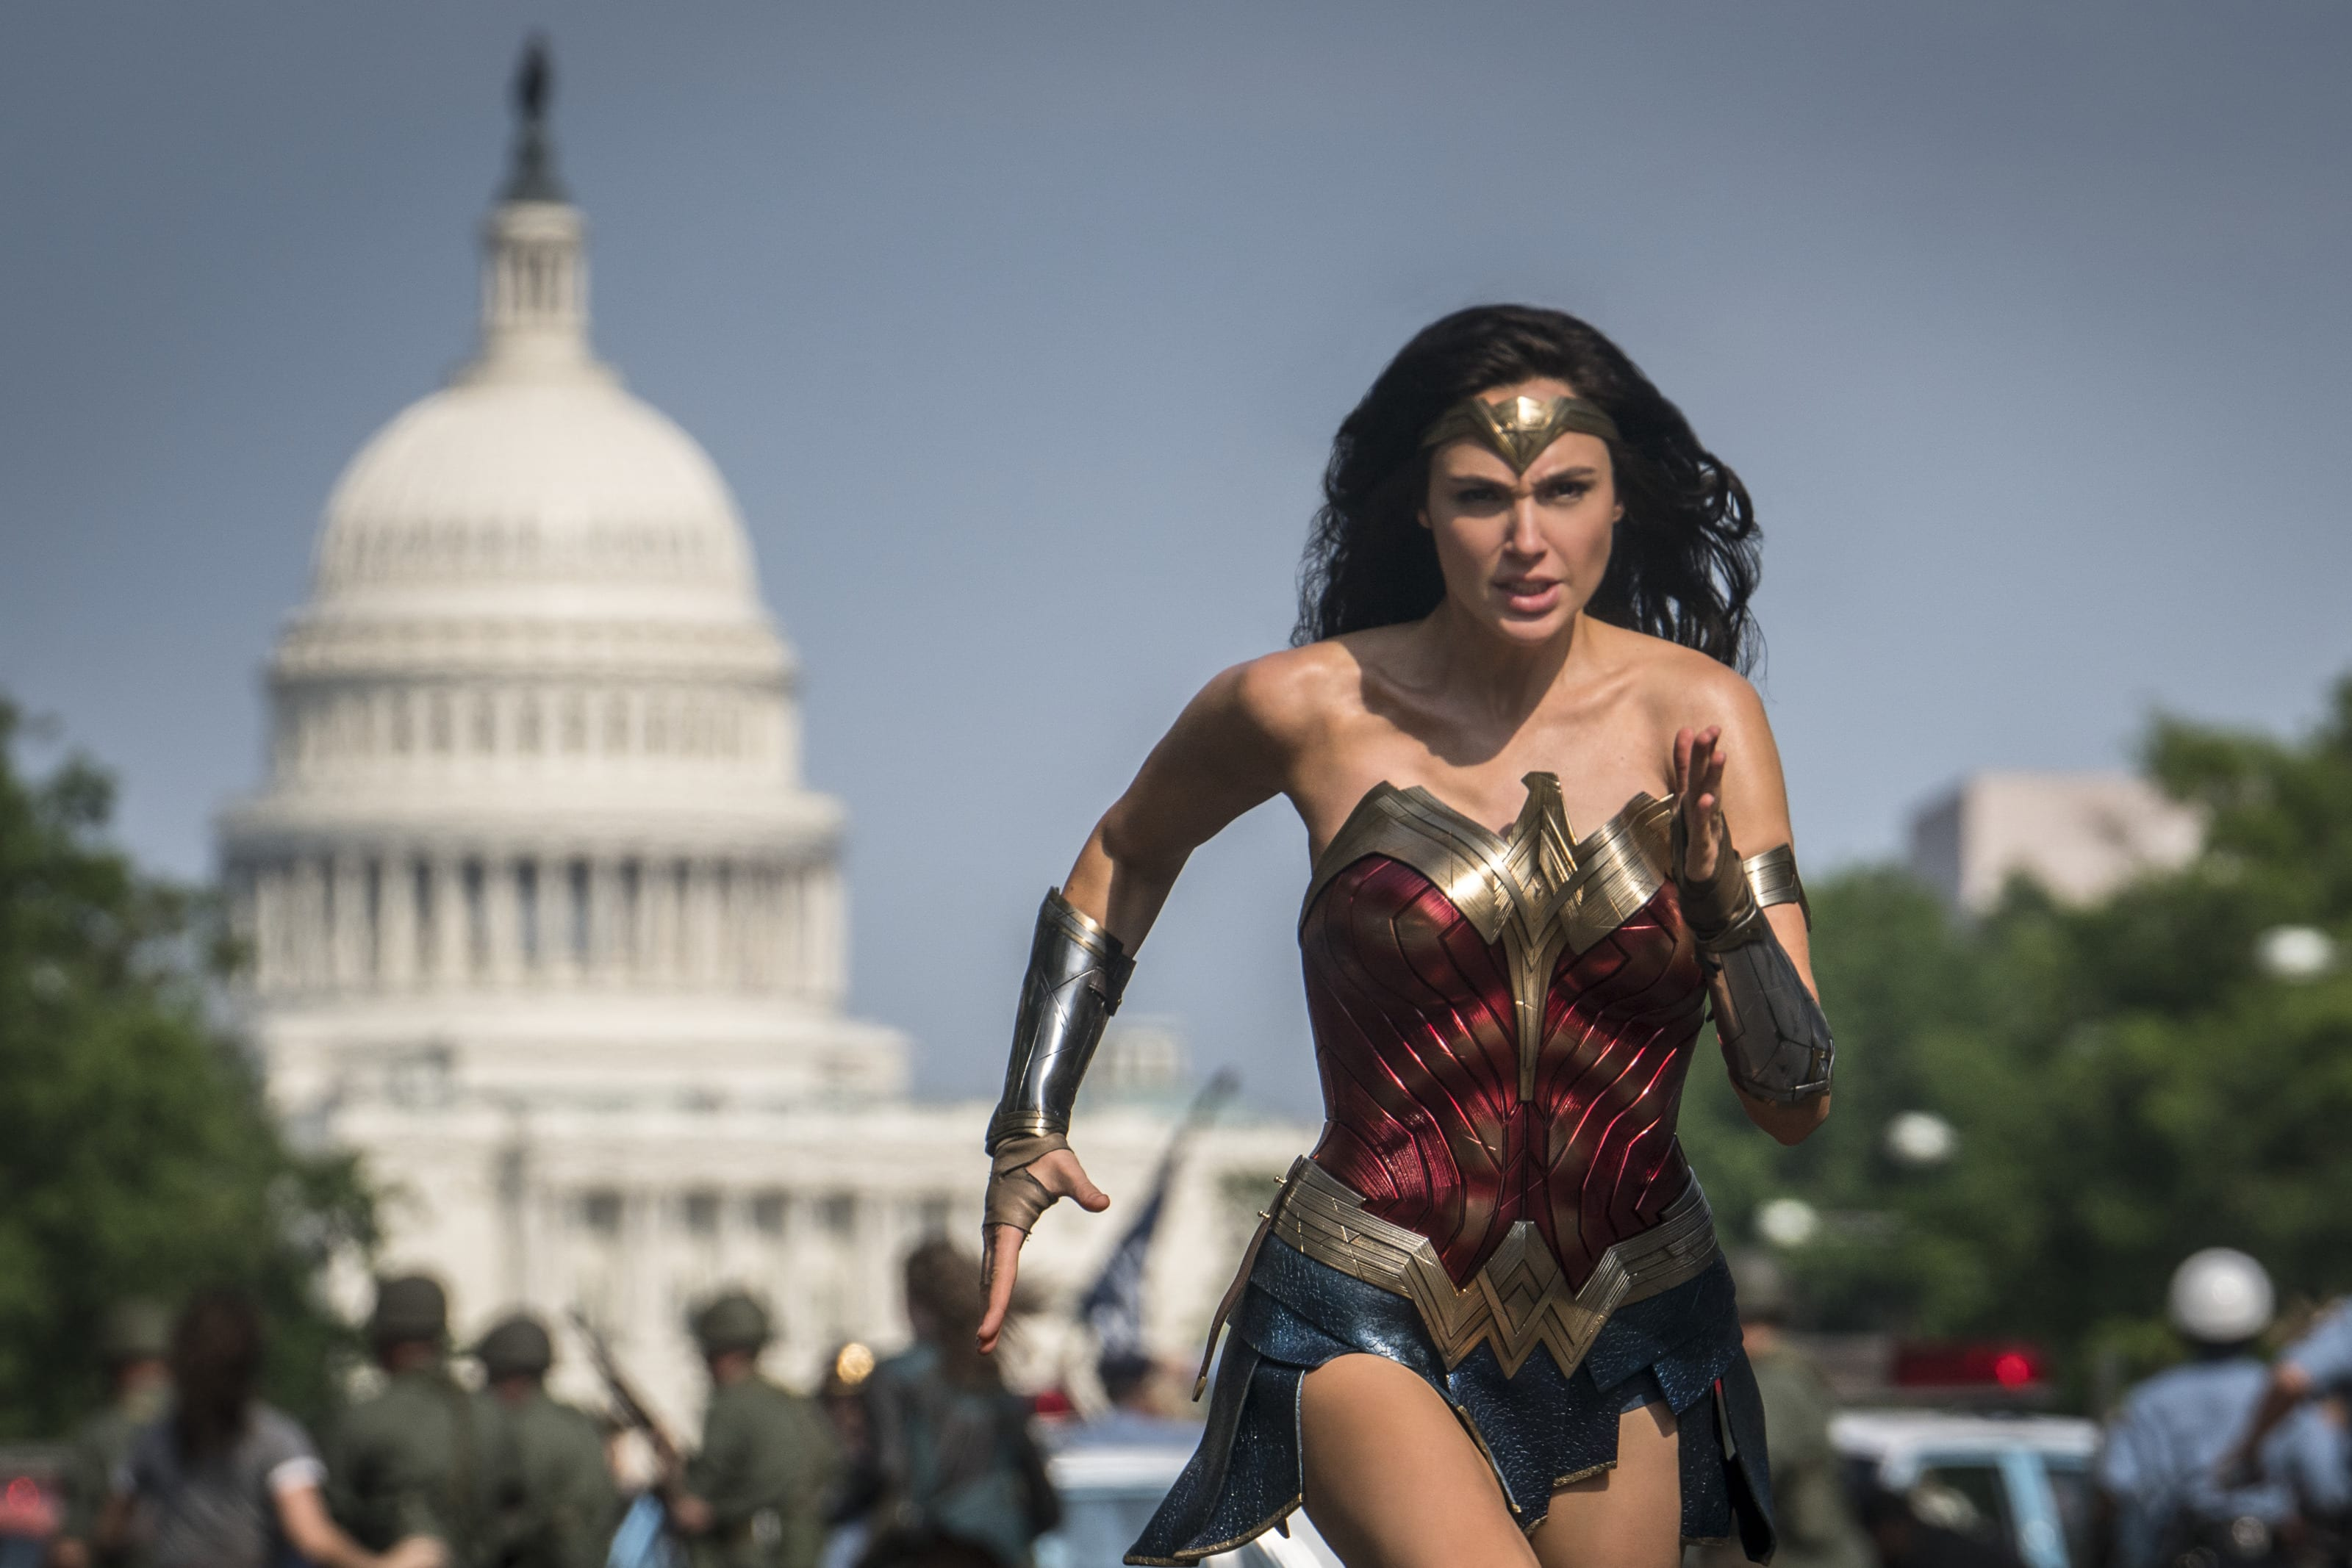 Wonder Woman, Wonder Woman 1984, DC animated films